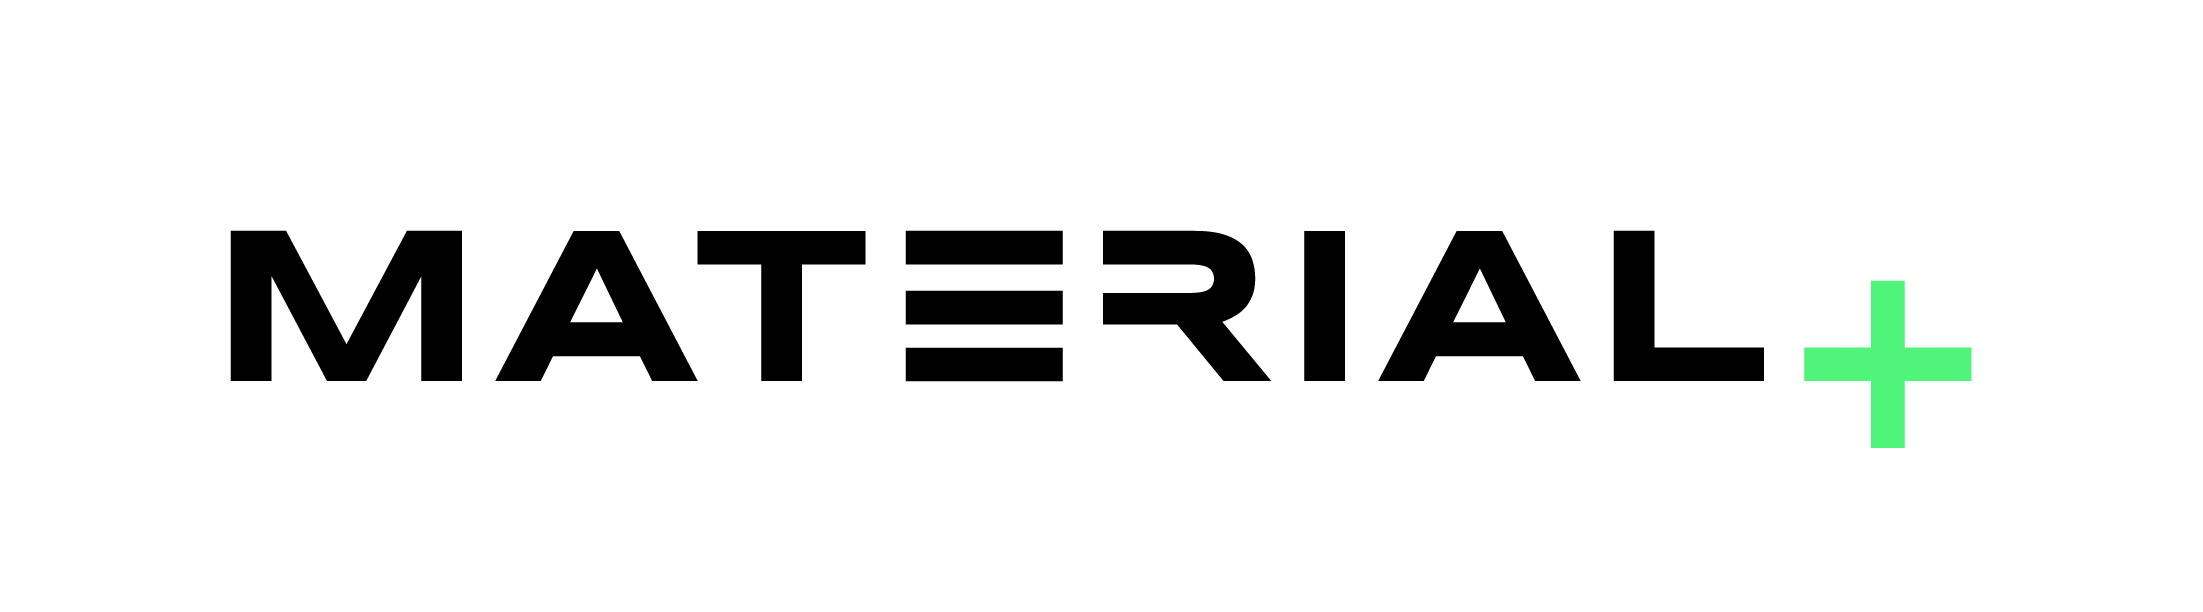 Material_Logo_BlkGrn_0520_150dpi